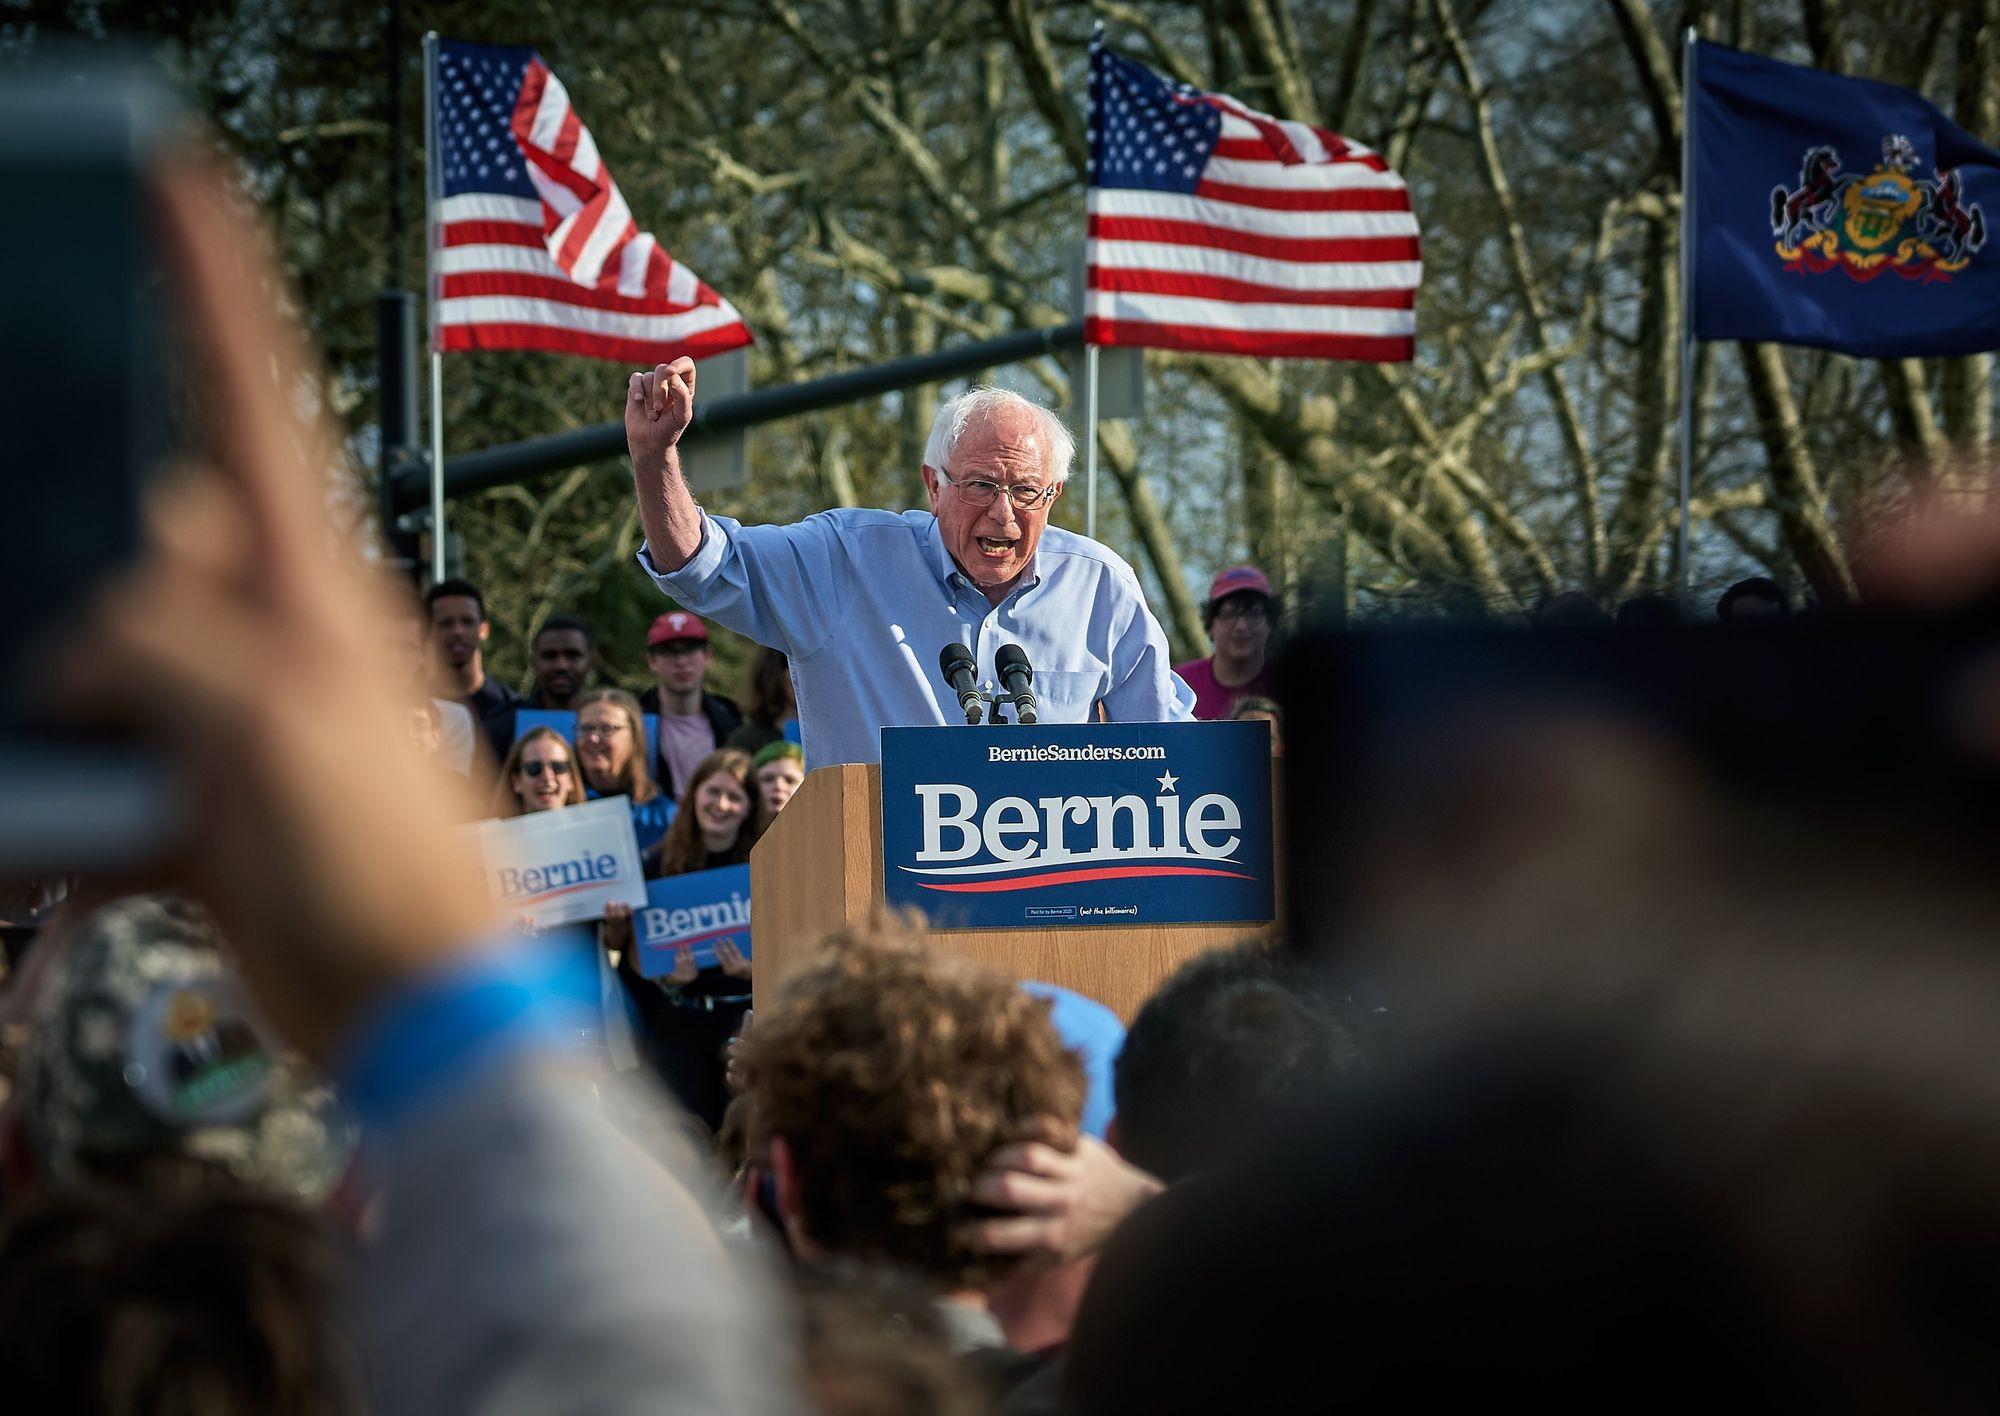 Sanders Havana Bad Time Following Cuba Comments